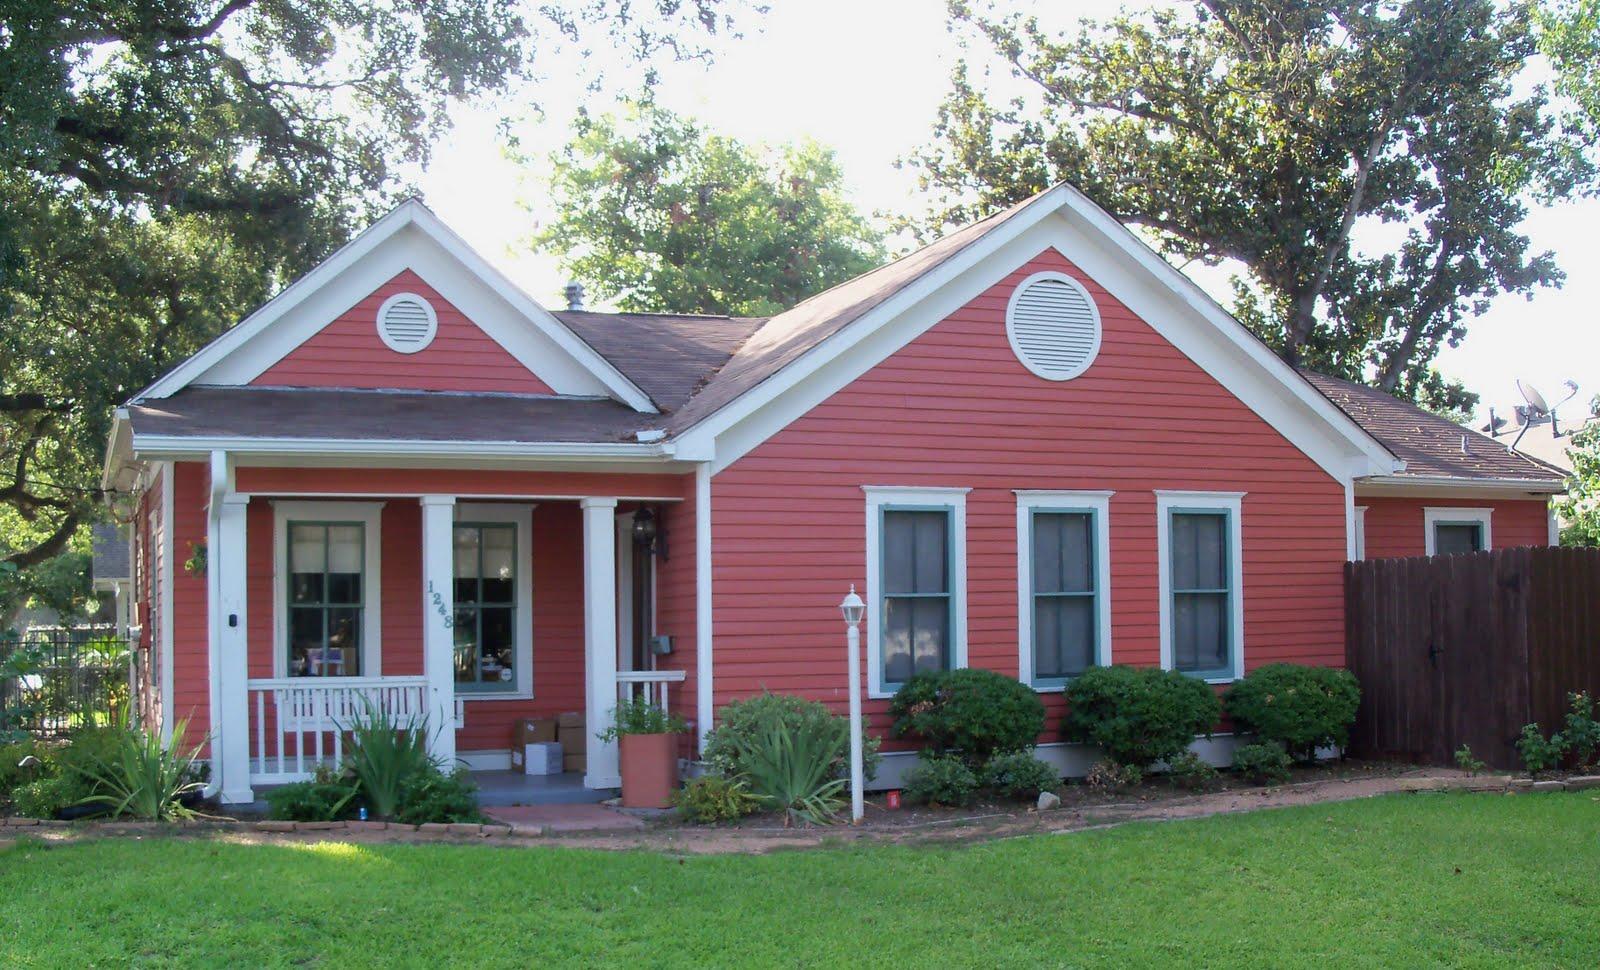 Little pink houses on pinterest pink houses pink and - Como pintar la fachada de mi casa ...